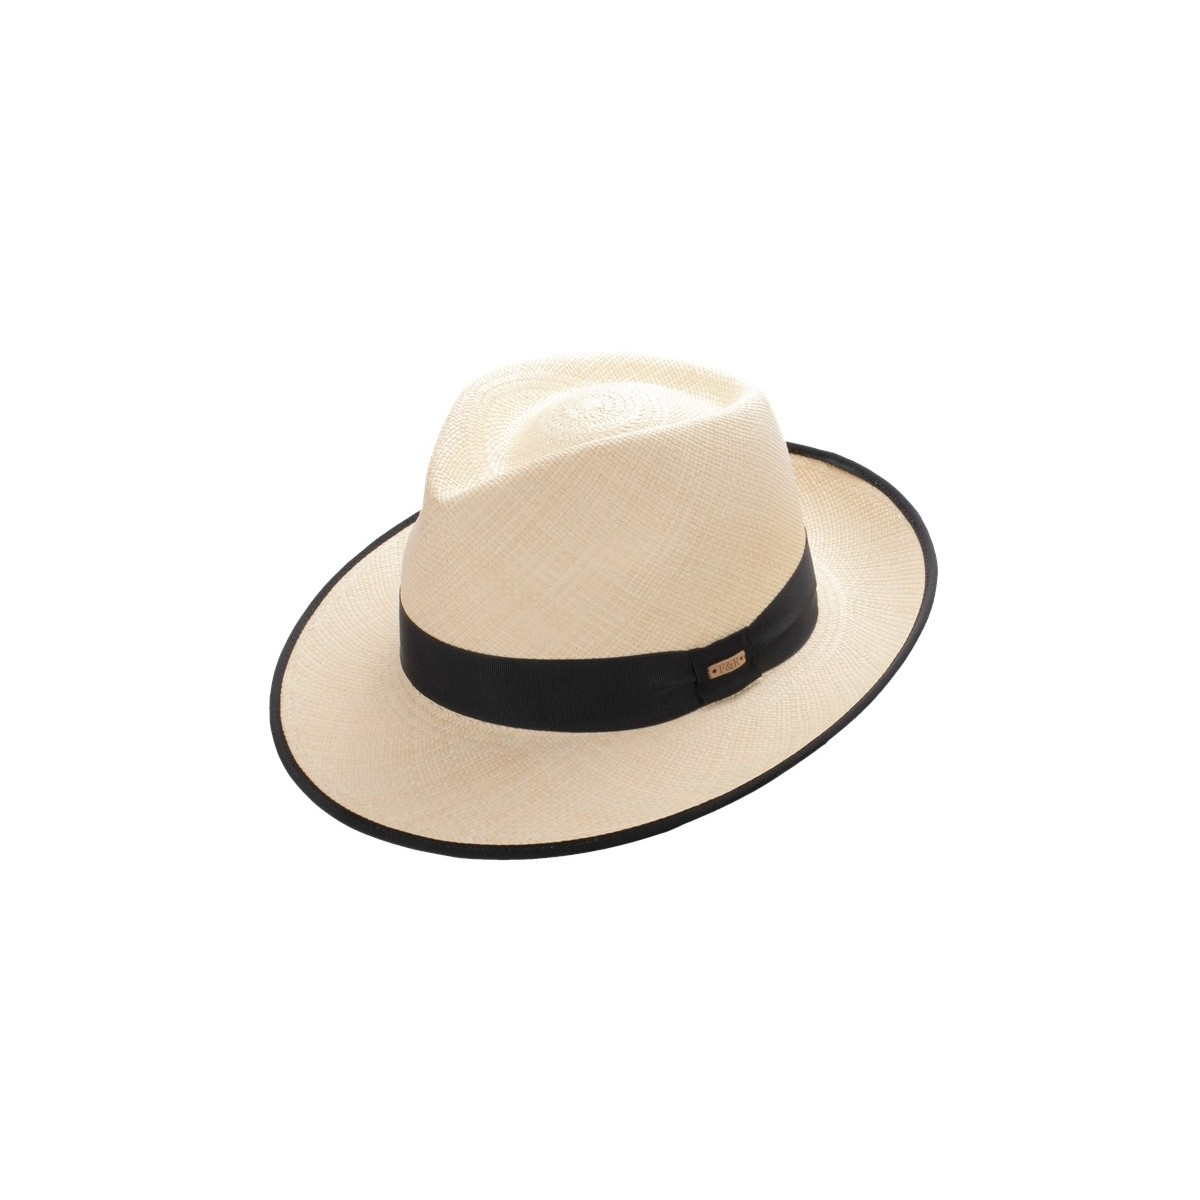 Condor Panama hat natural color and grosgrain ribbon. Fernández y Roche